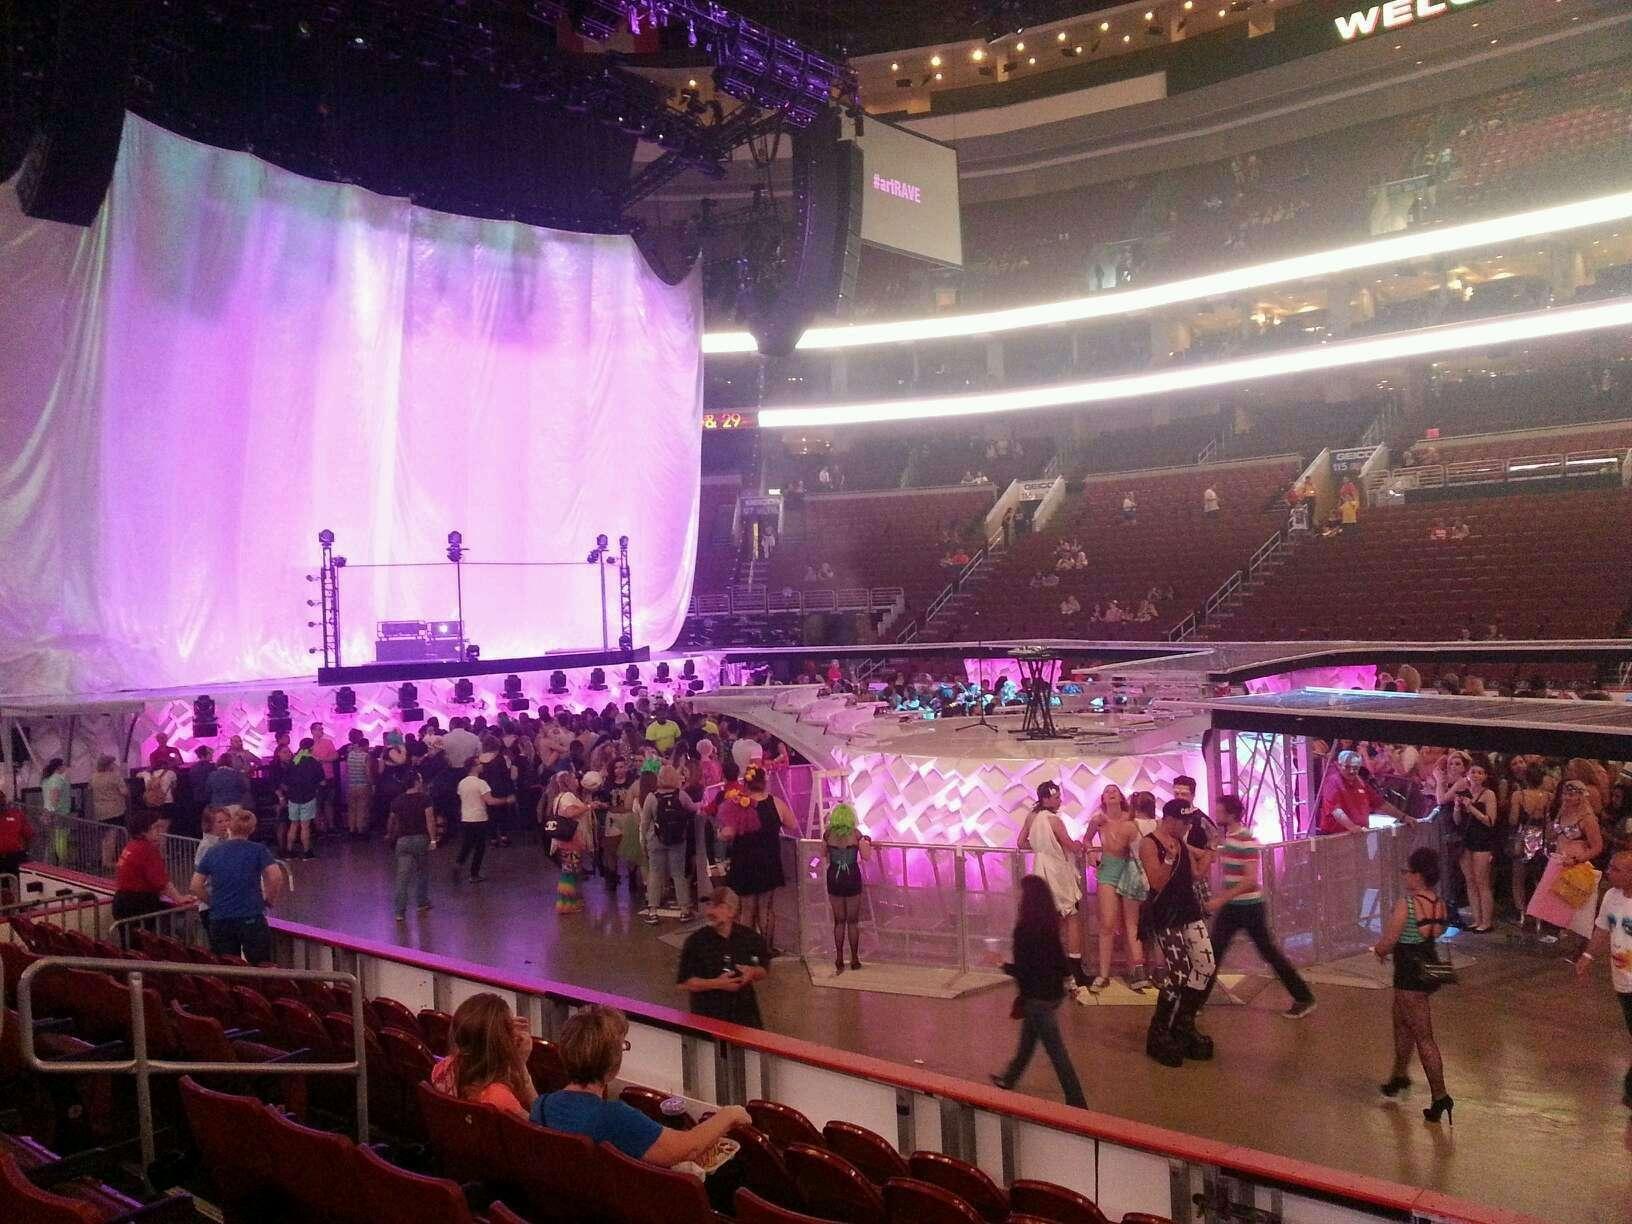 Wells Fargo Center Concert